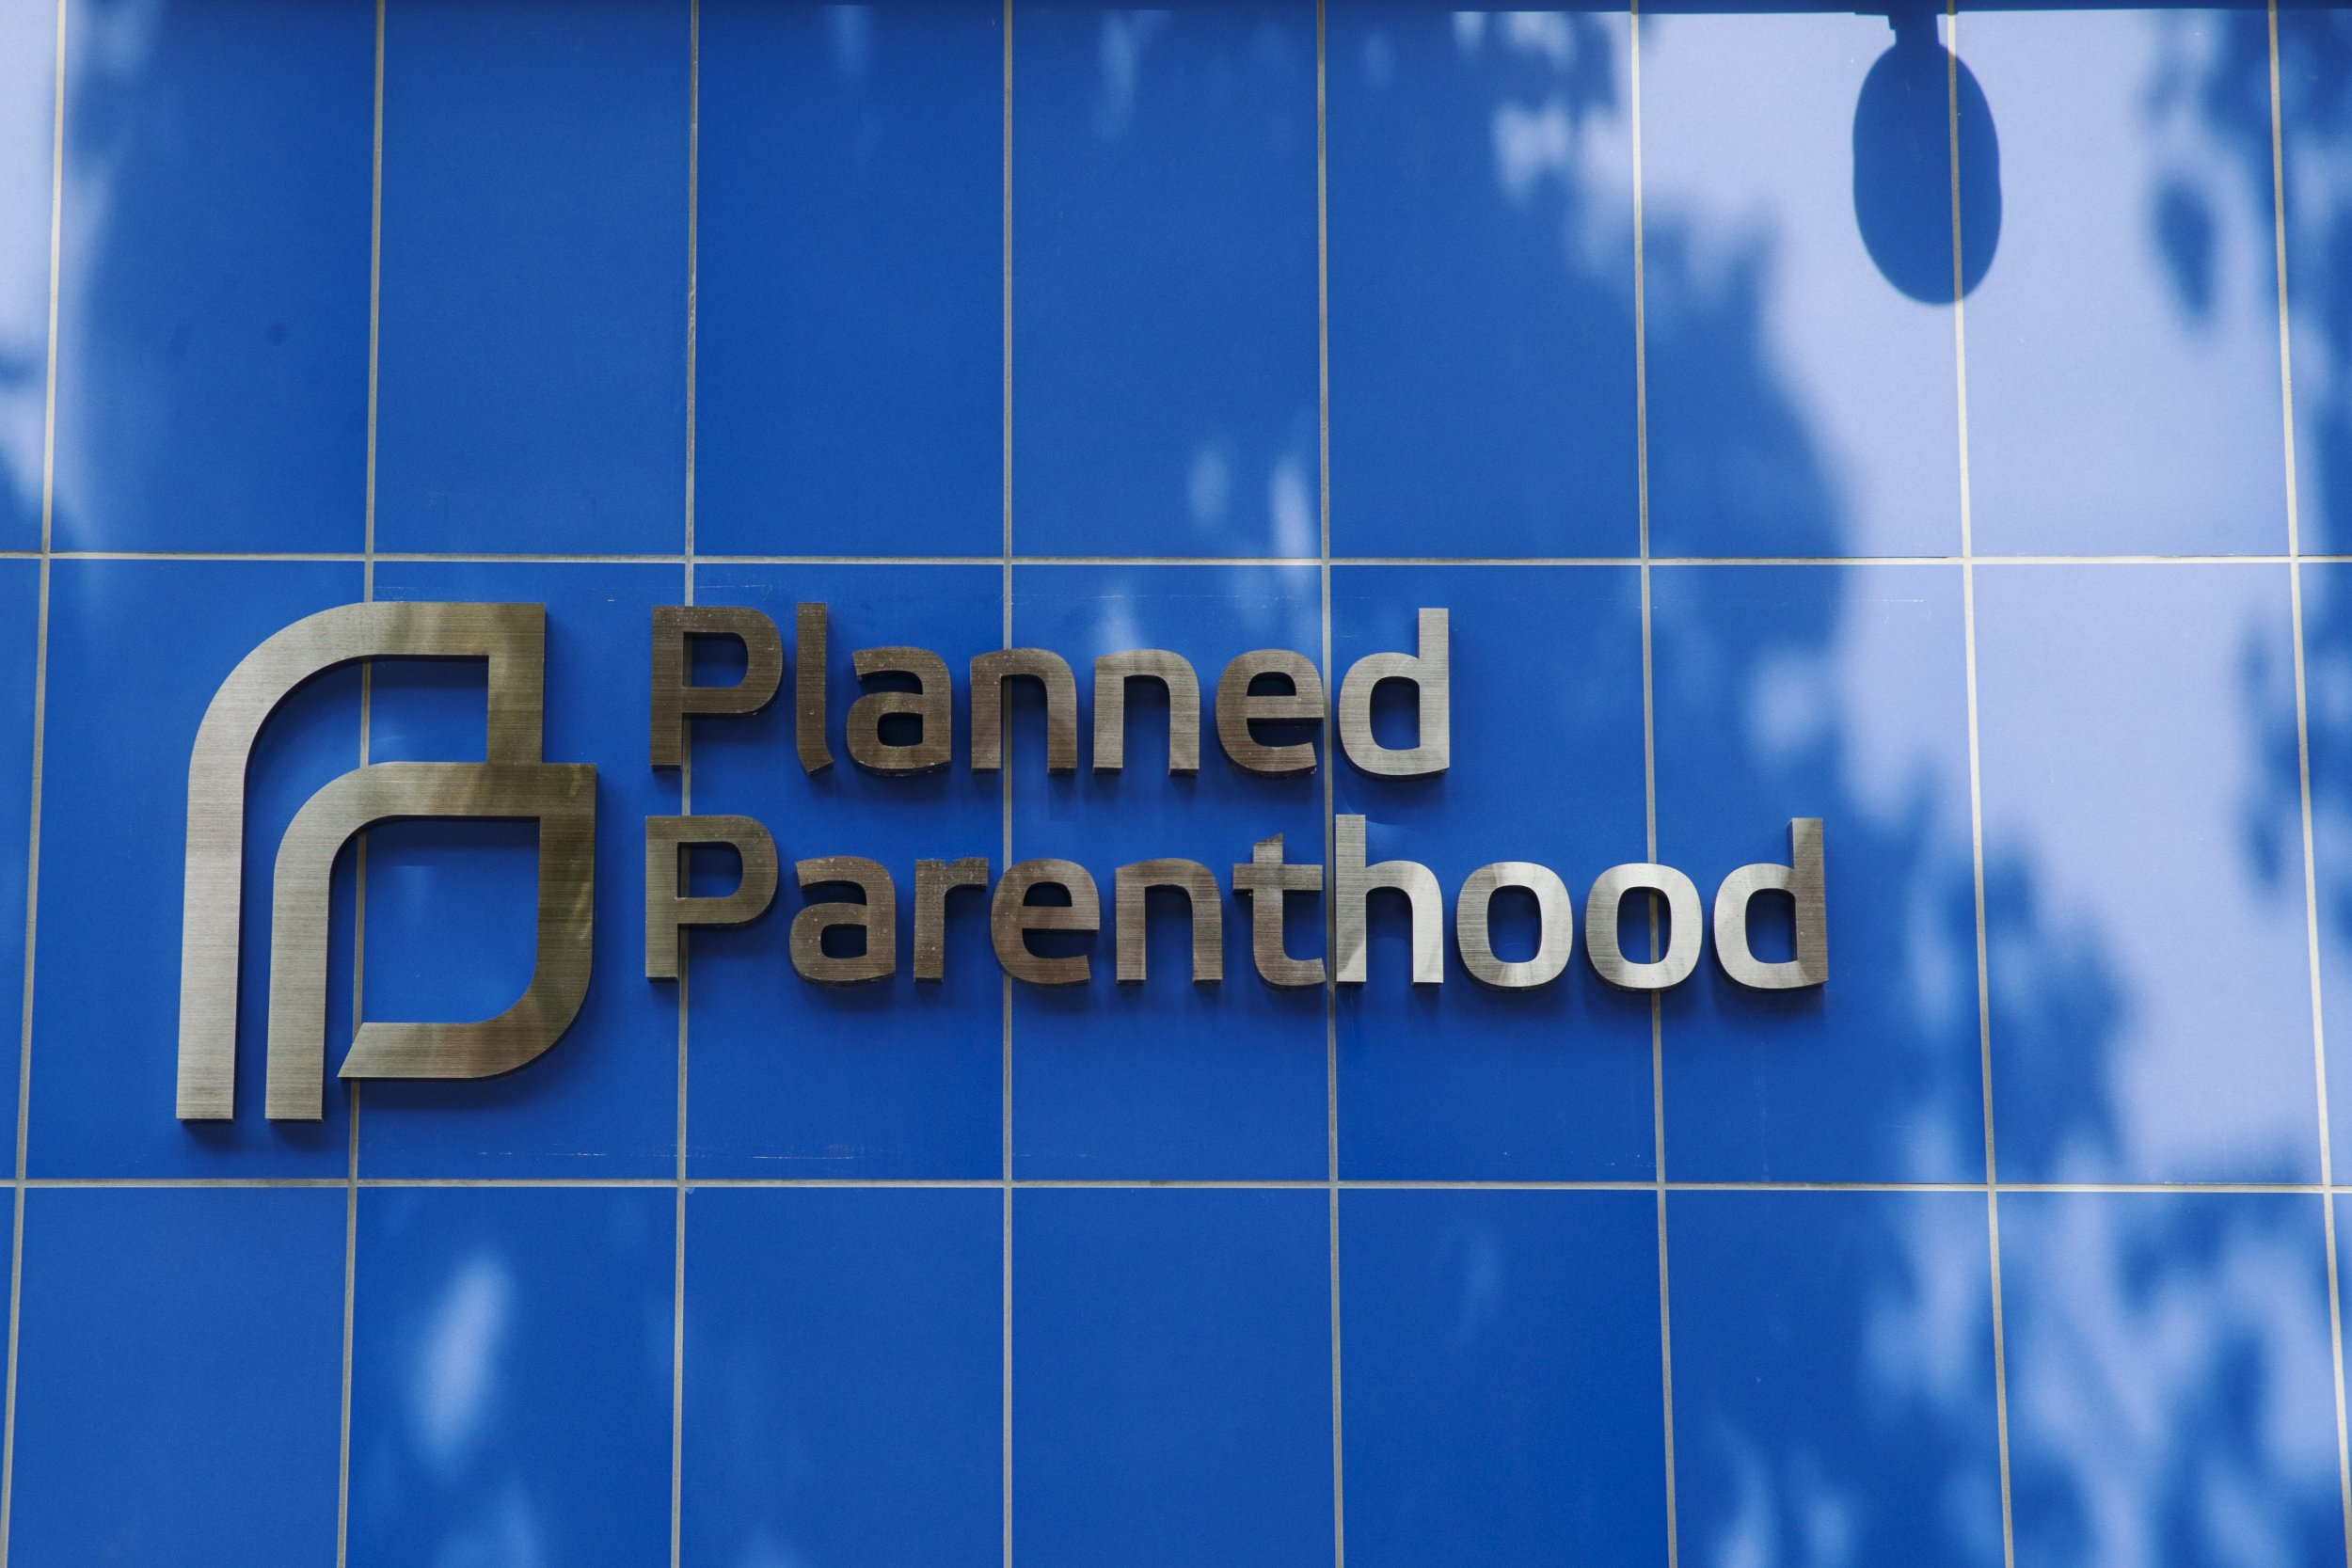 12_03_Planned_Parenthood_01